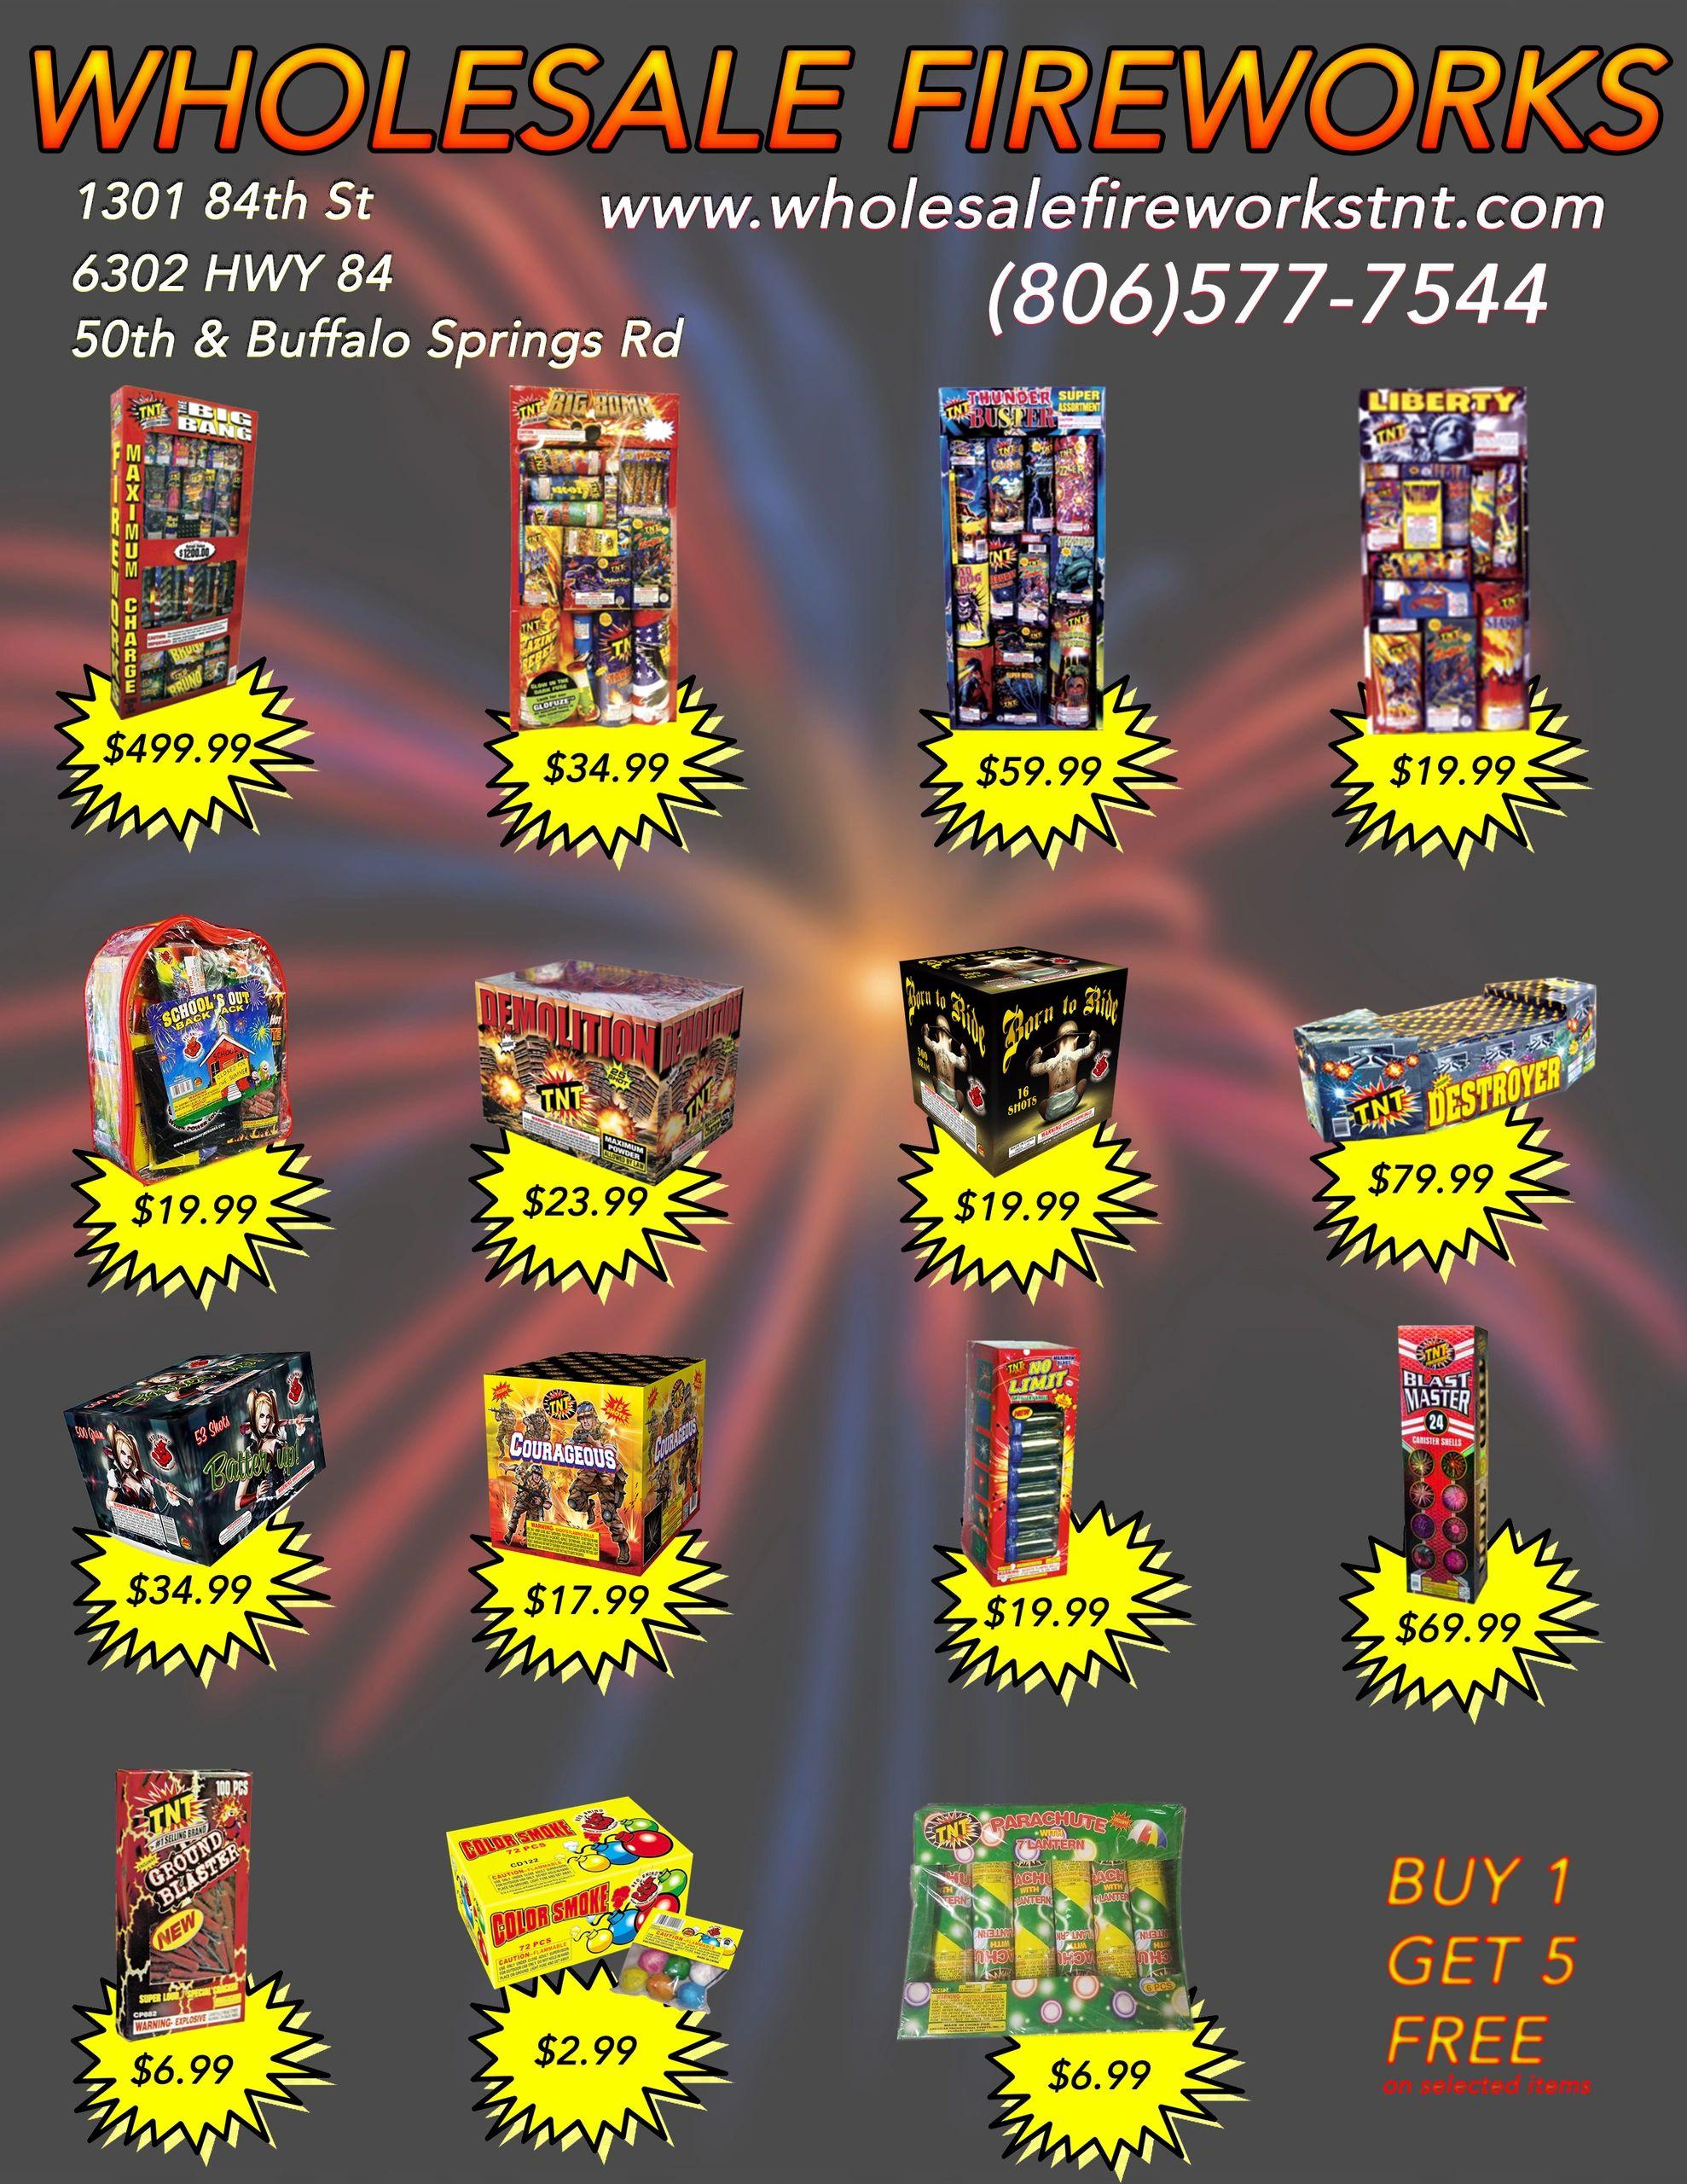 Wholesale Fireworks TNT - Fireworks, Tnt